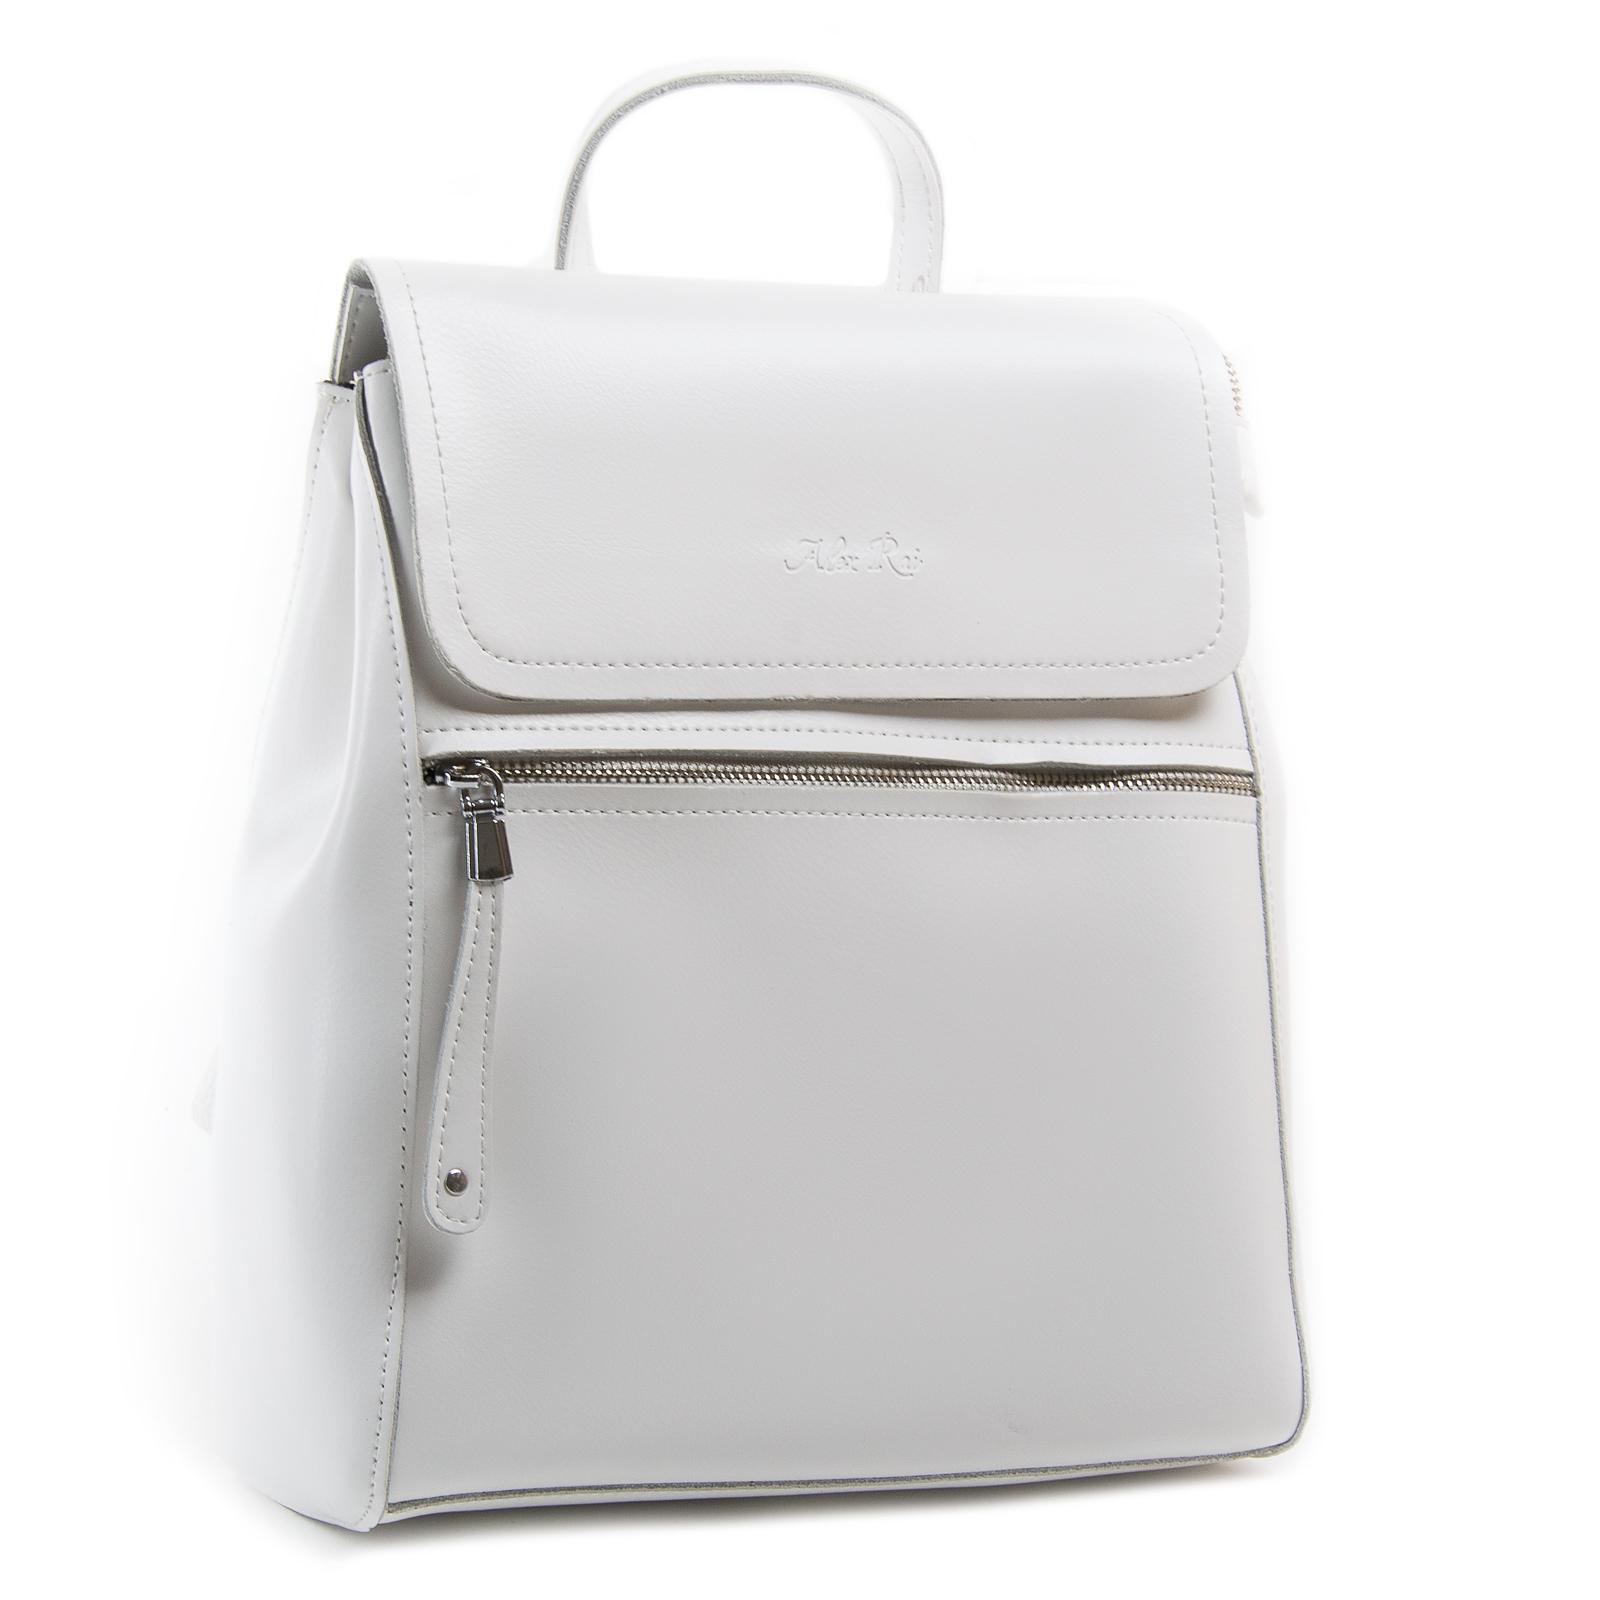 Сумка Женская Рюкзак кожа ALEX RAI 03-01 1005 white